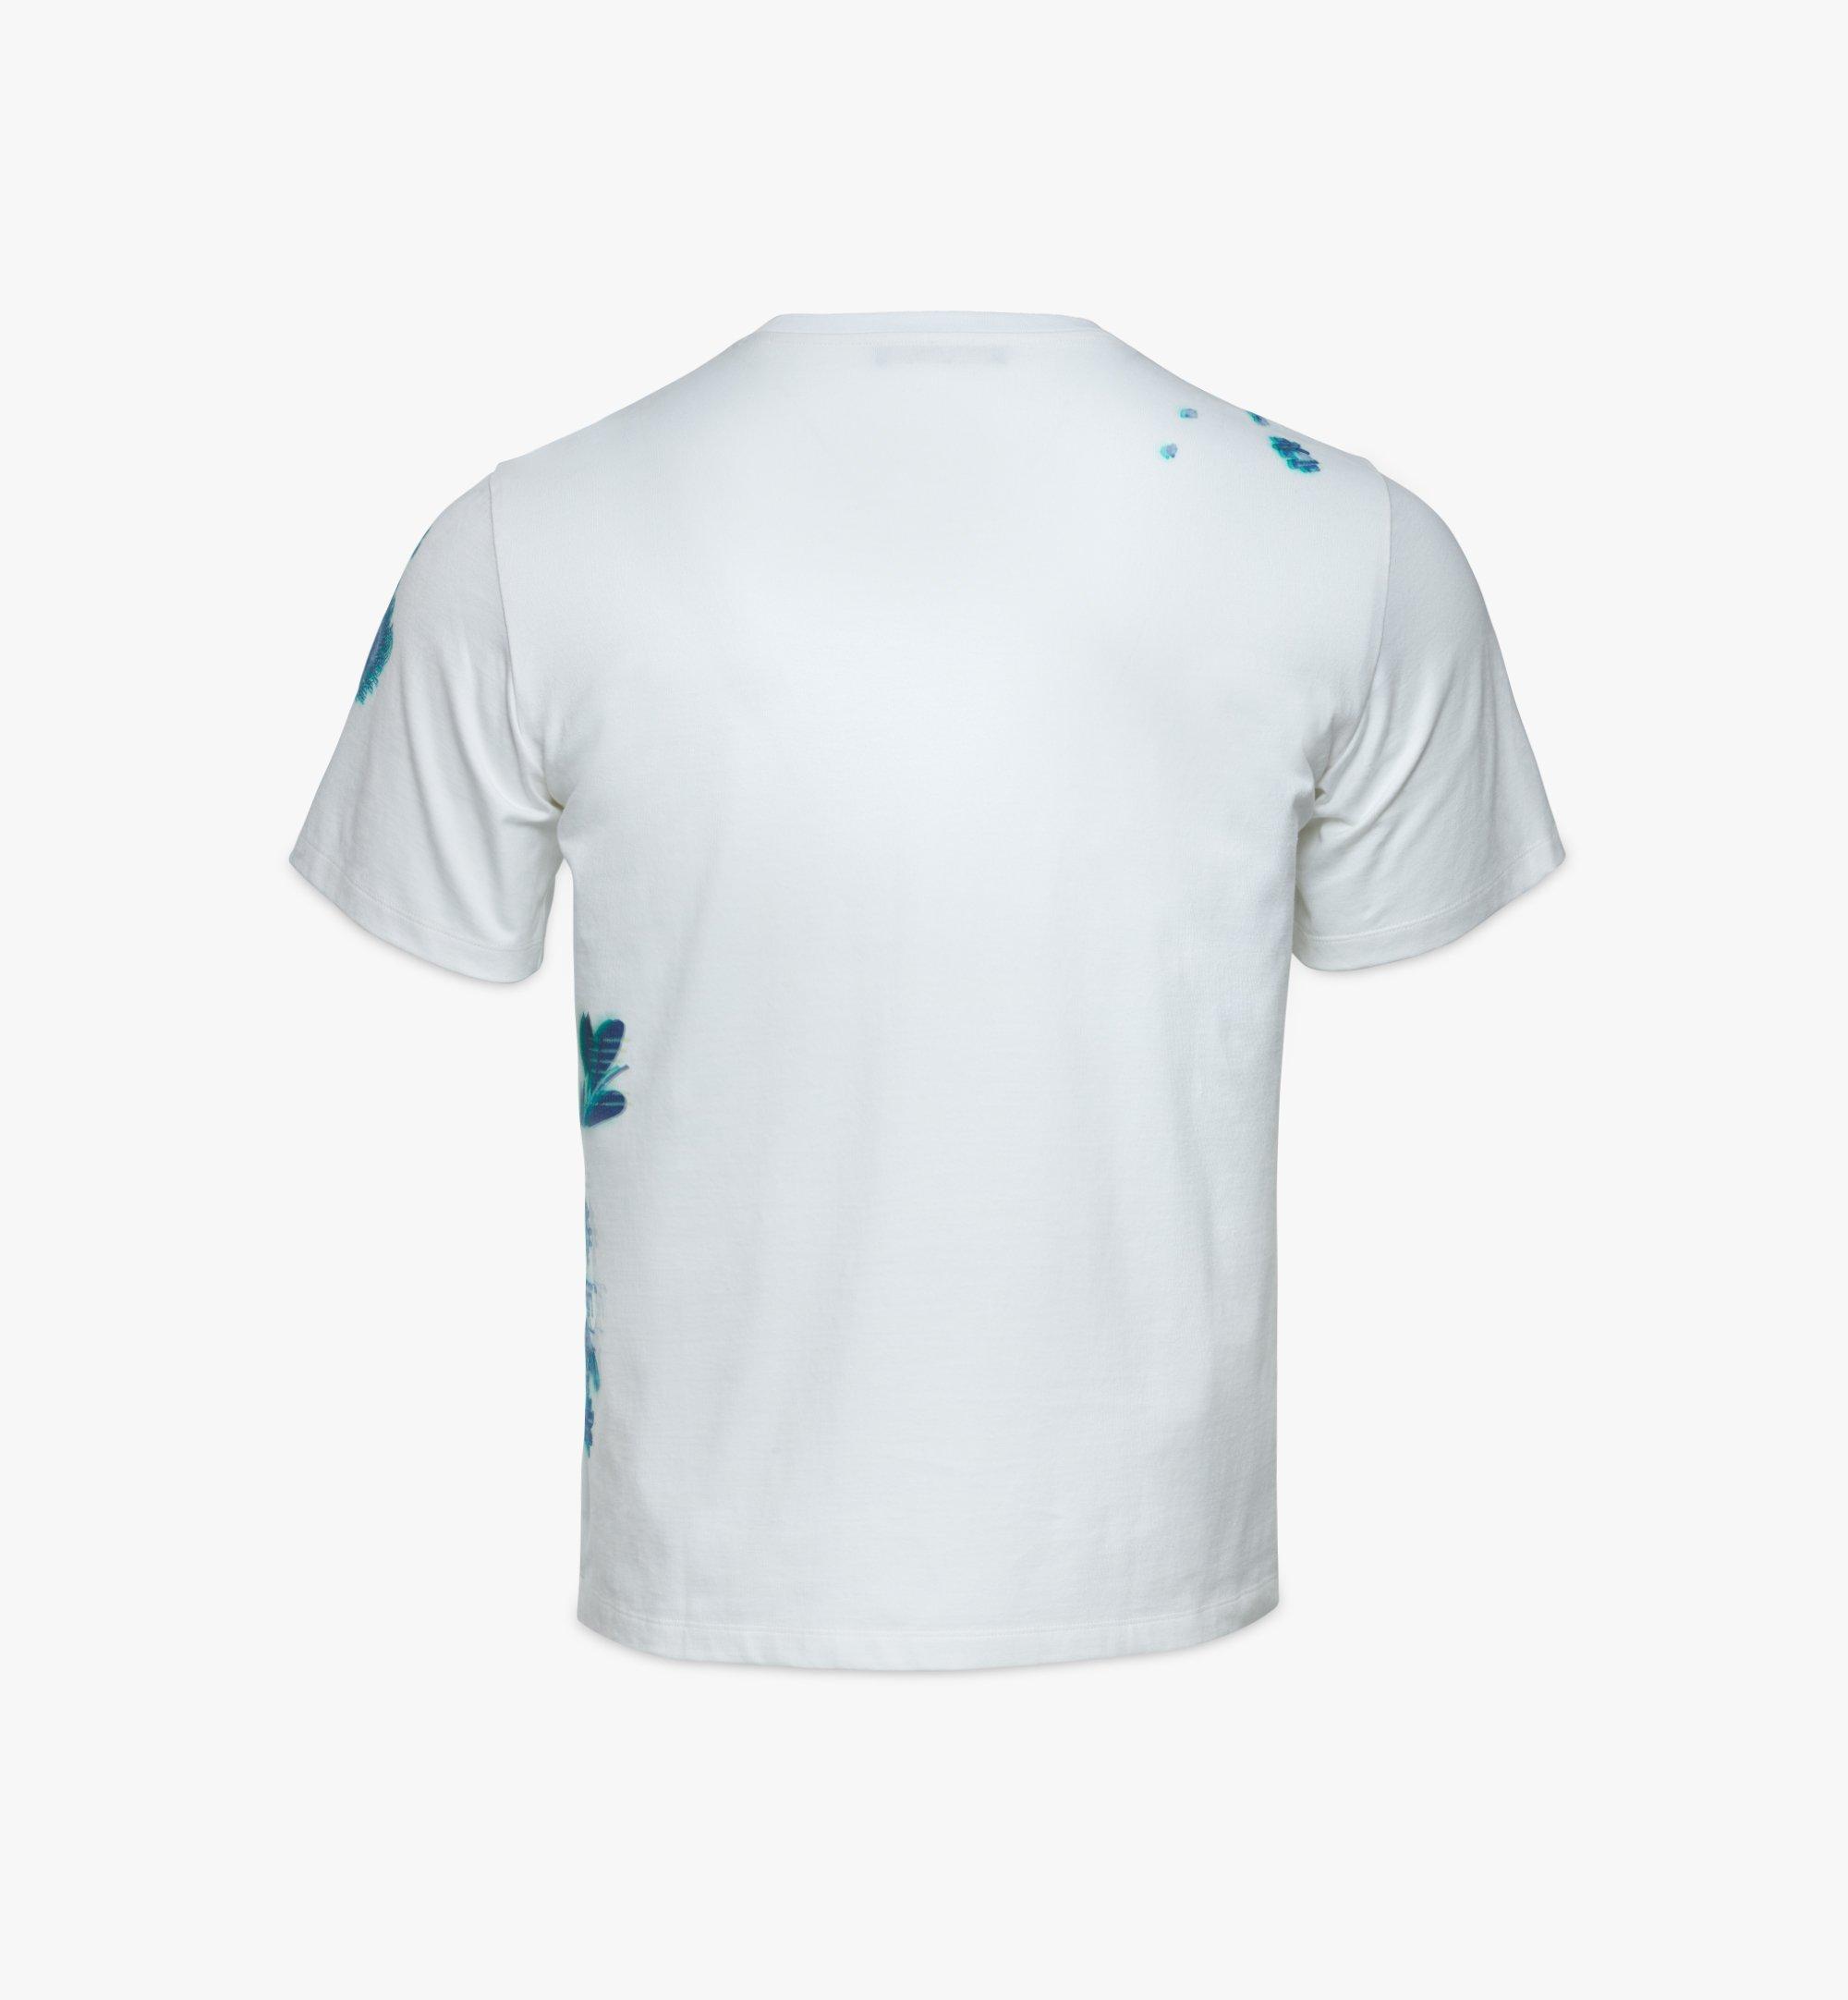 MCM 男士科技花卉印花T恤 White MHTBSMM07WT00S 更多视角 1